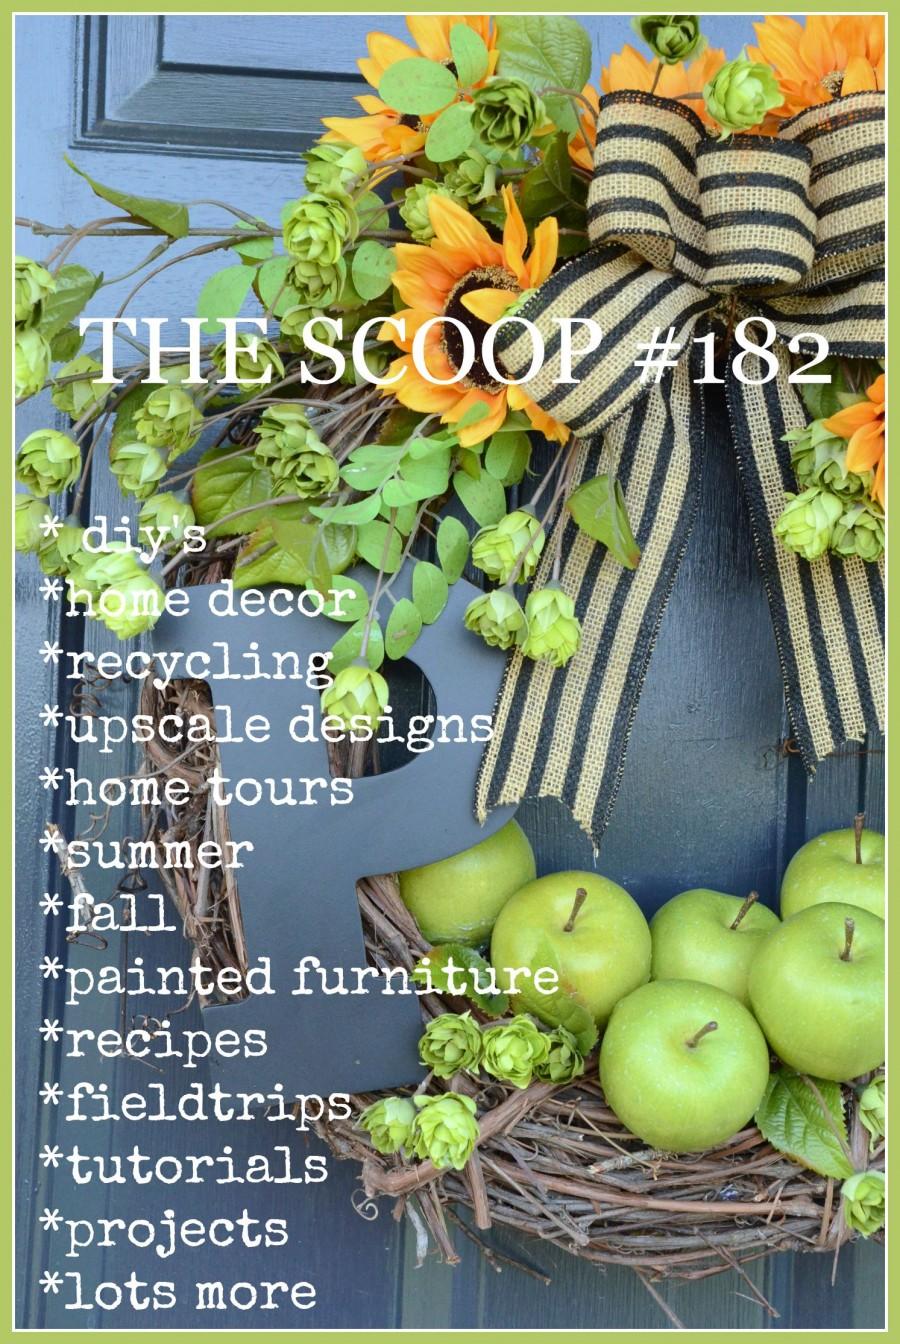 THE SCOOP #182- HUNDREDS of great ideas and inspiration! stonegableblog.com